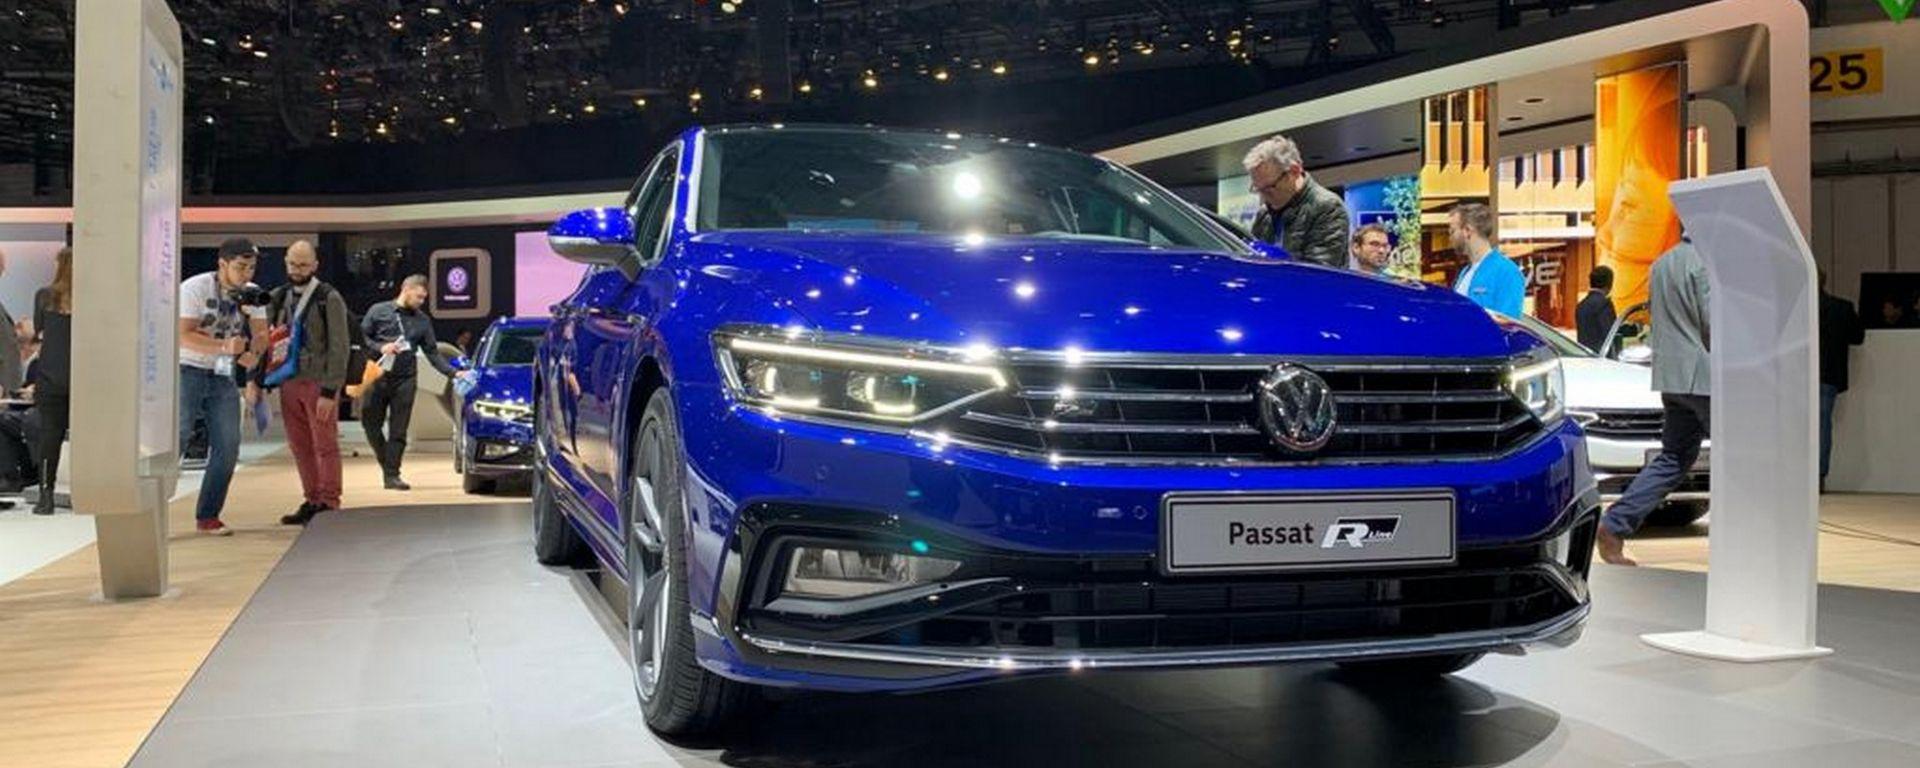 Volkswagen Passat 2019: eccola, con Diesel più ecologici